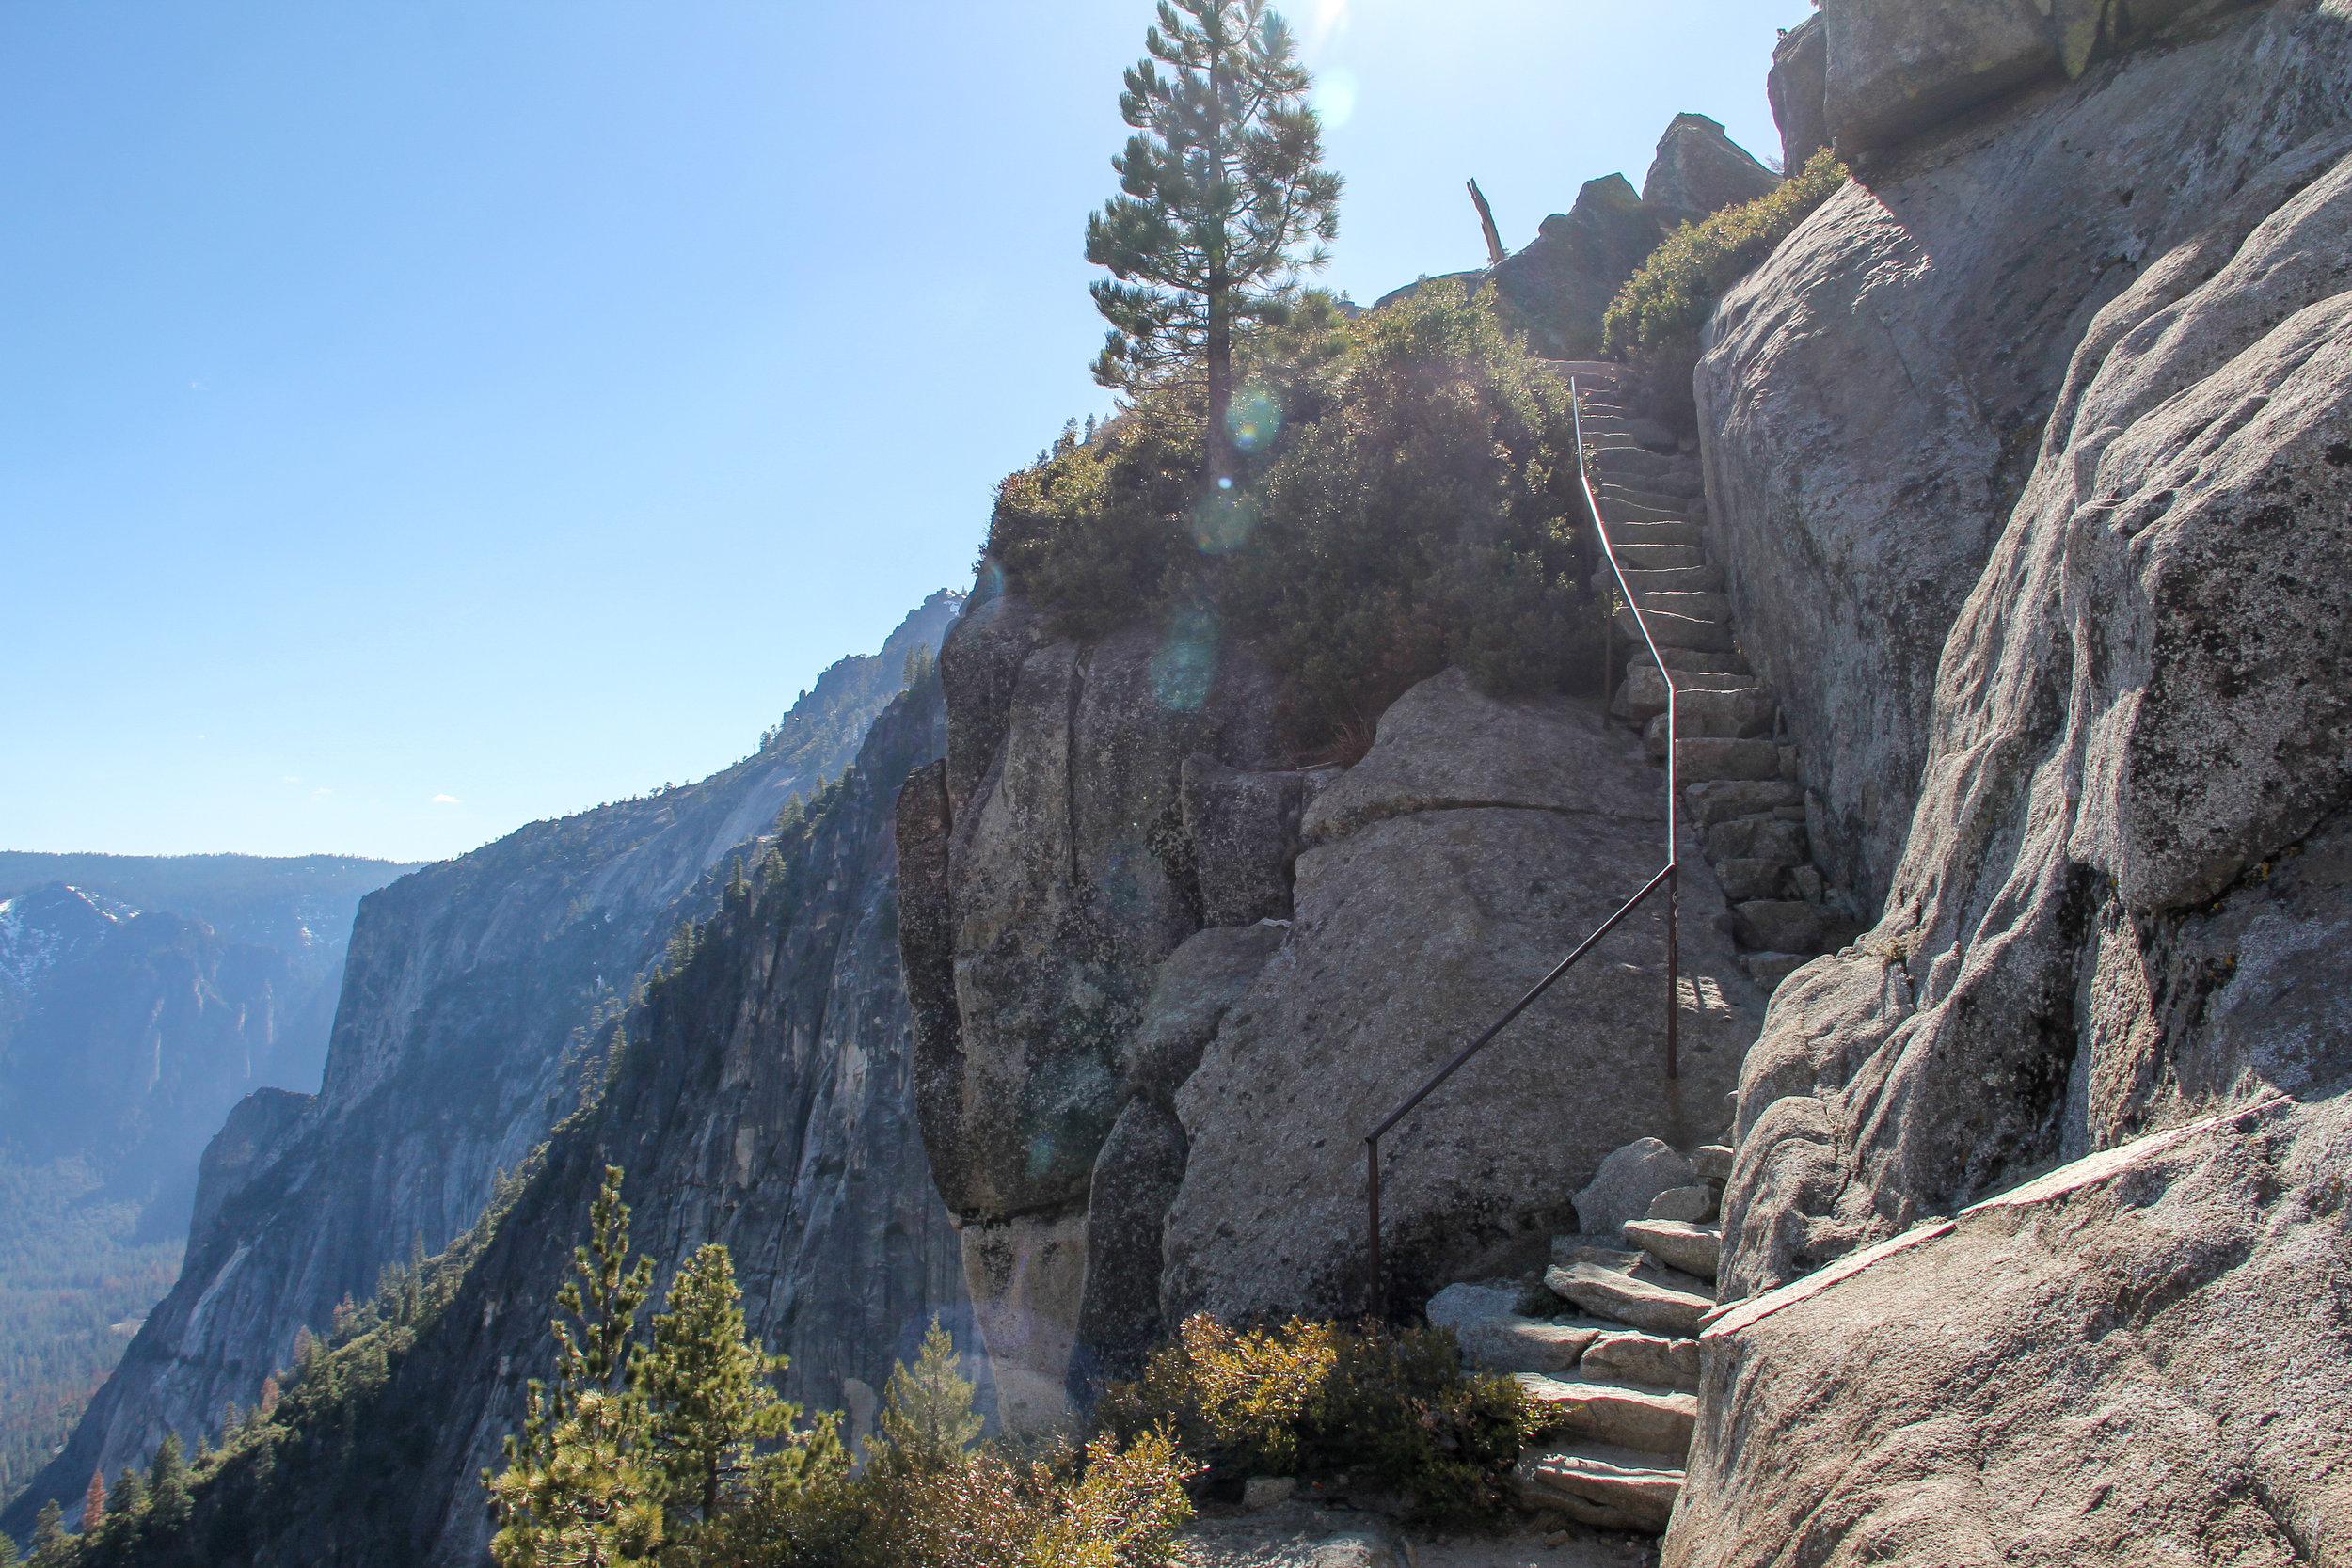 The Last Stretch of the Upper Yosemite Falls Trail, 2016